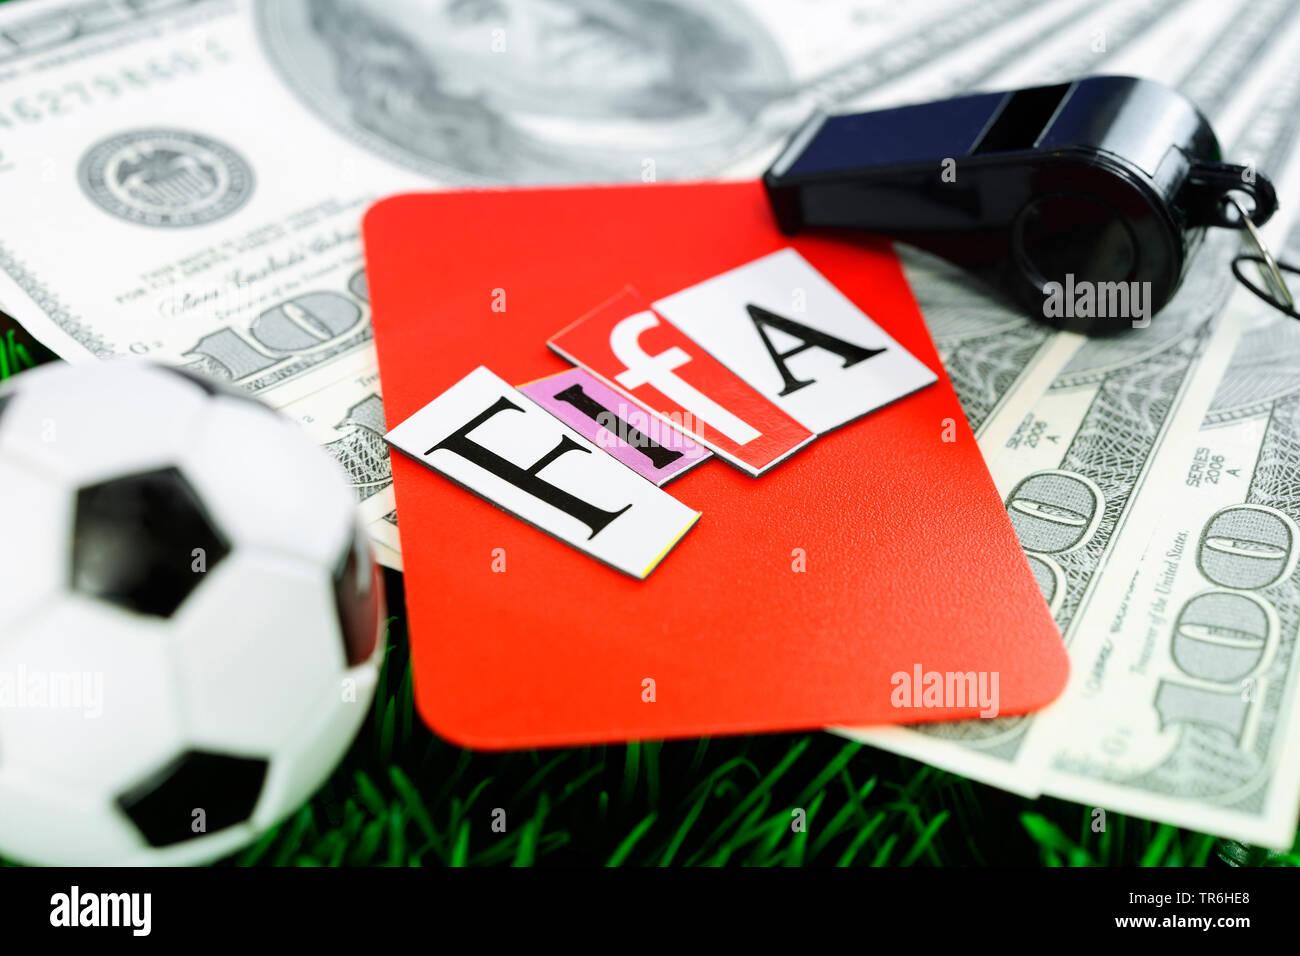 Miniaturfussball mit roter Karte, Dollarscheinen und Pfeife, Fifa-Skandal | red card and football, dollar bills and whistle, FIFA scandal  | BLWS48452 - Stock Image